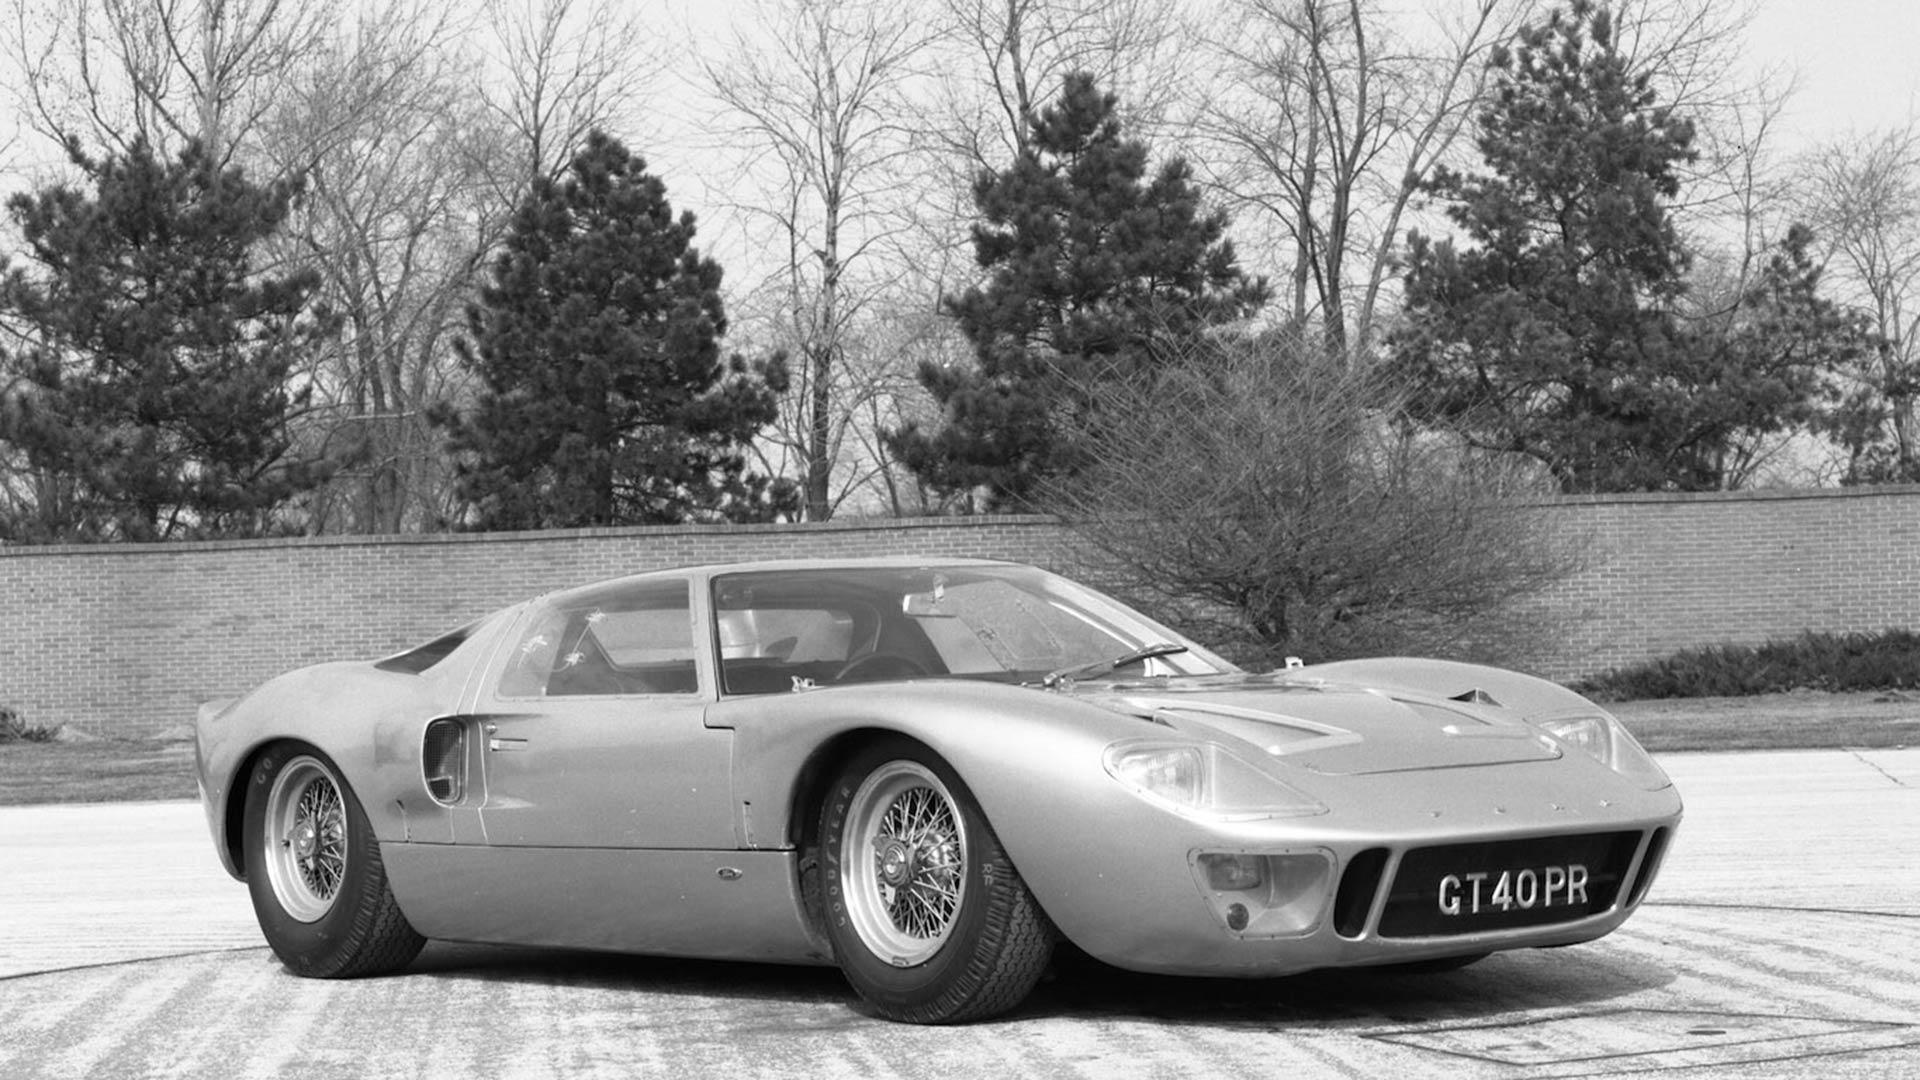 1966 Ford GT40 Mk I road car